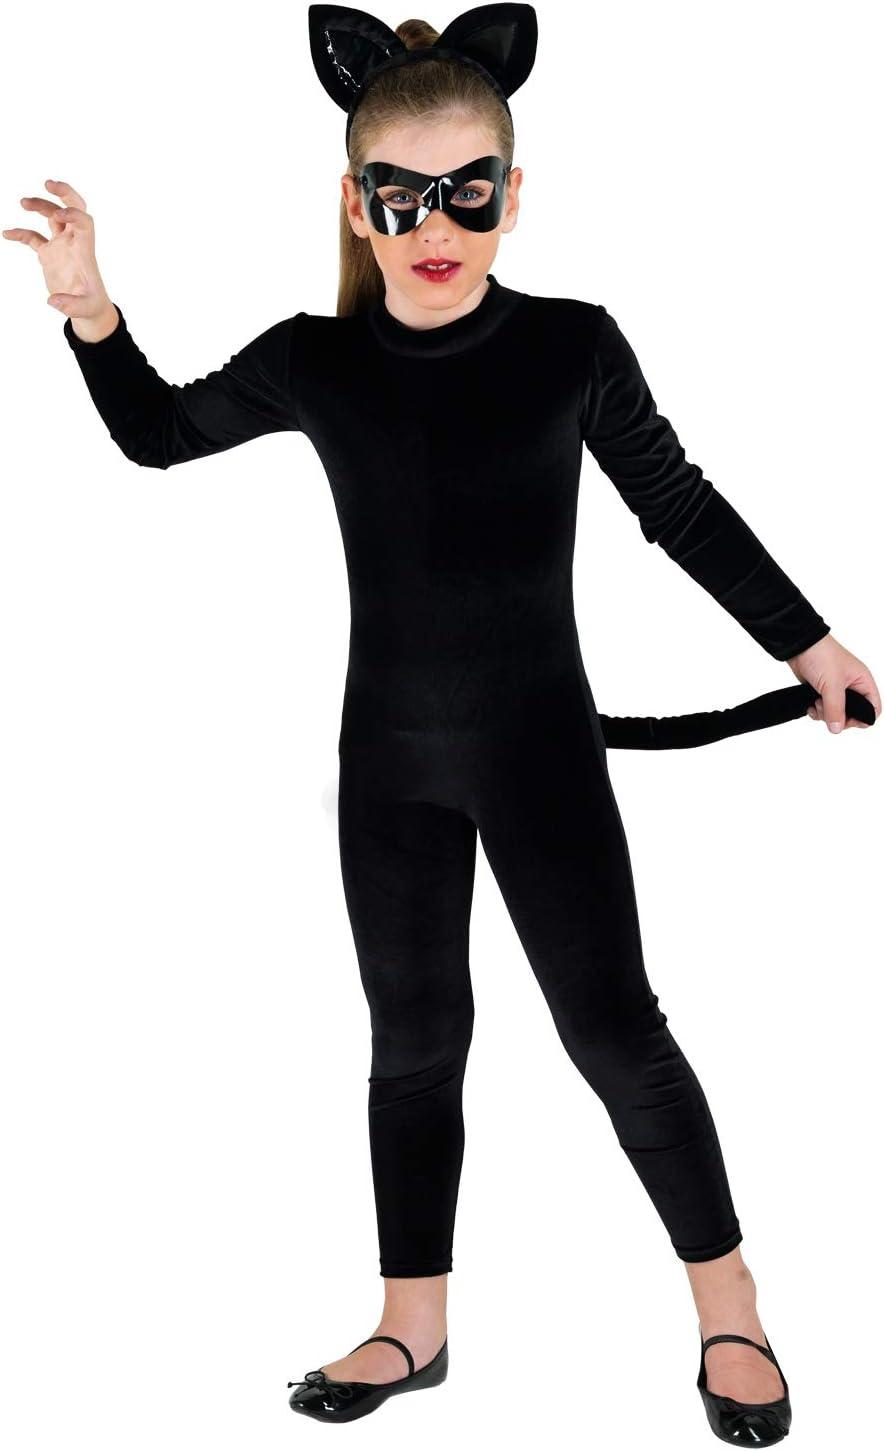 chiber Disfraces Disfraz Niña Gato Negro (Talla 6 (4-6 años ...